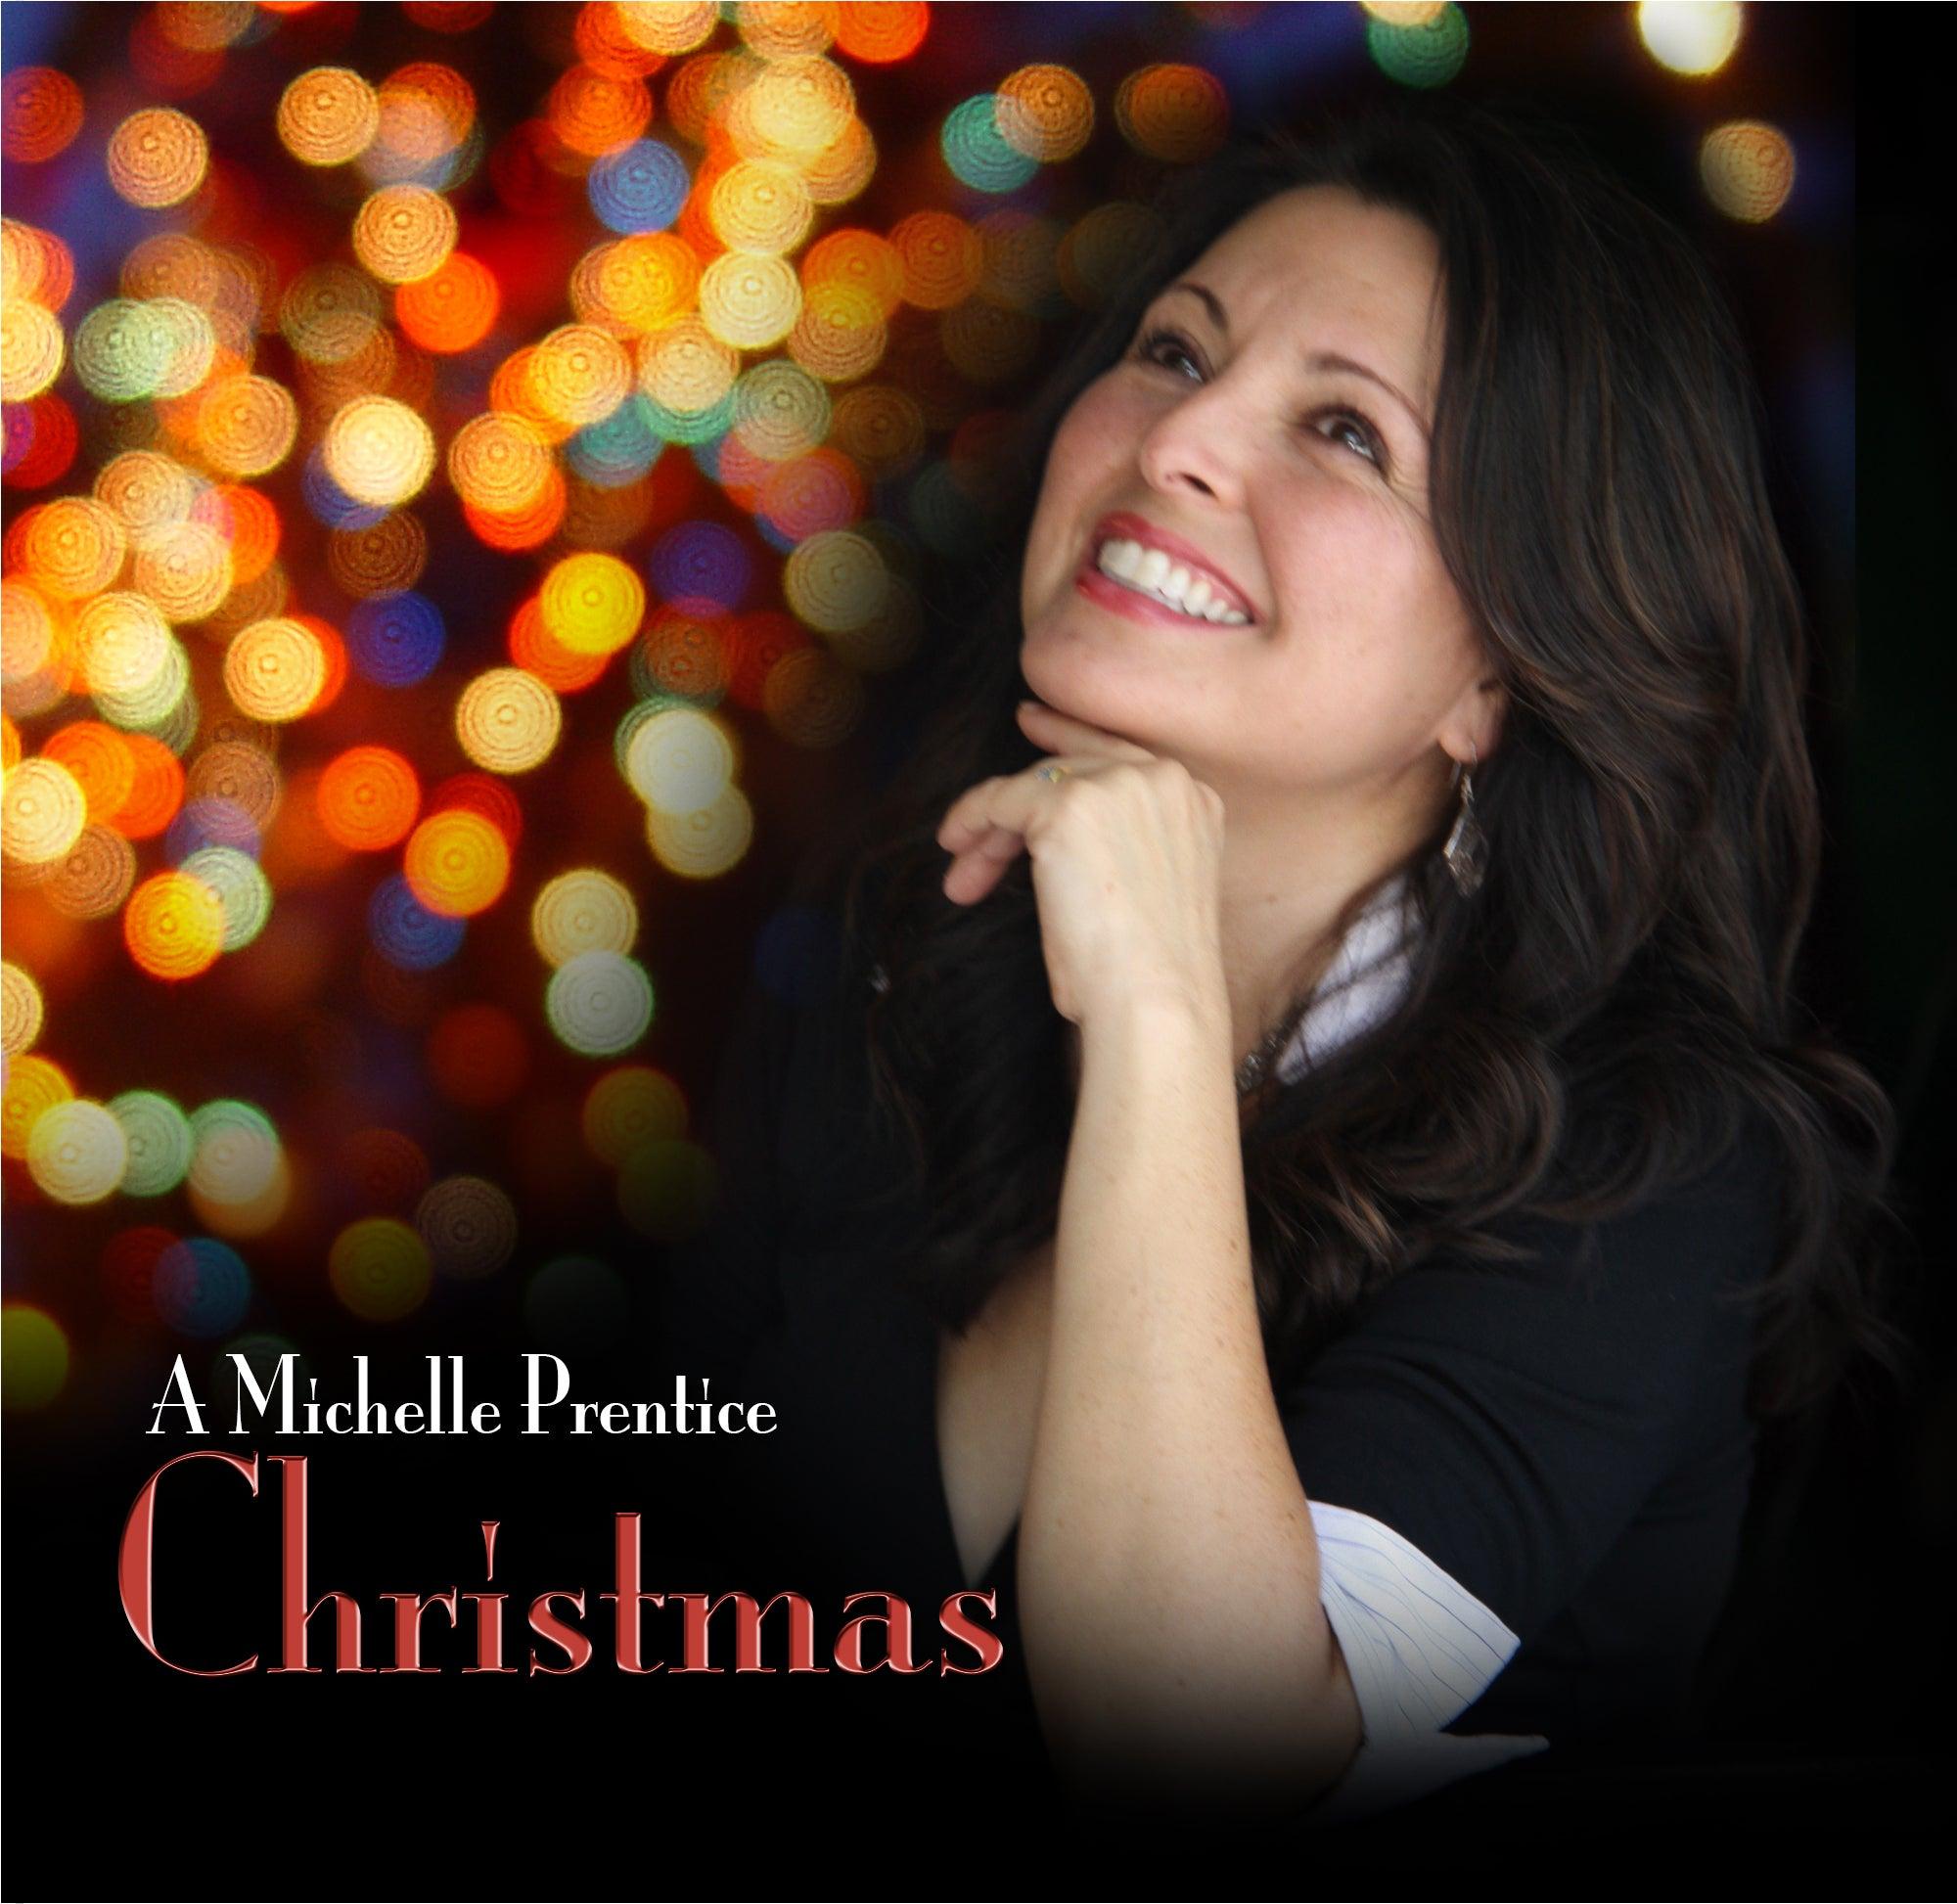 """Sleighbells"" by Michelle Prentice (Album: A Michelle Prentice Christmas)"